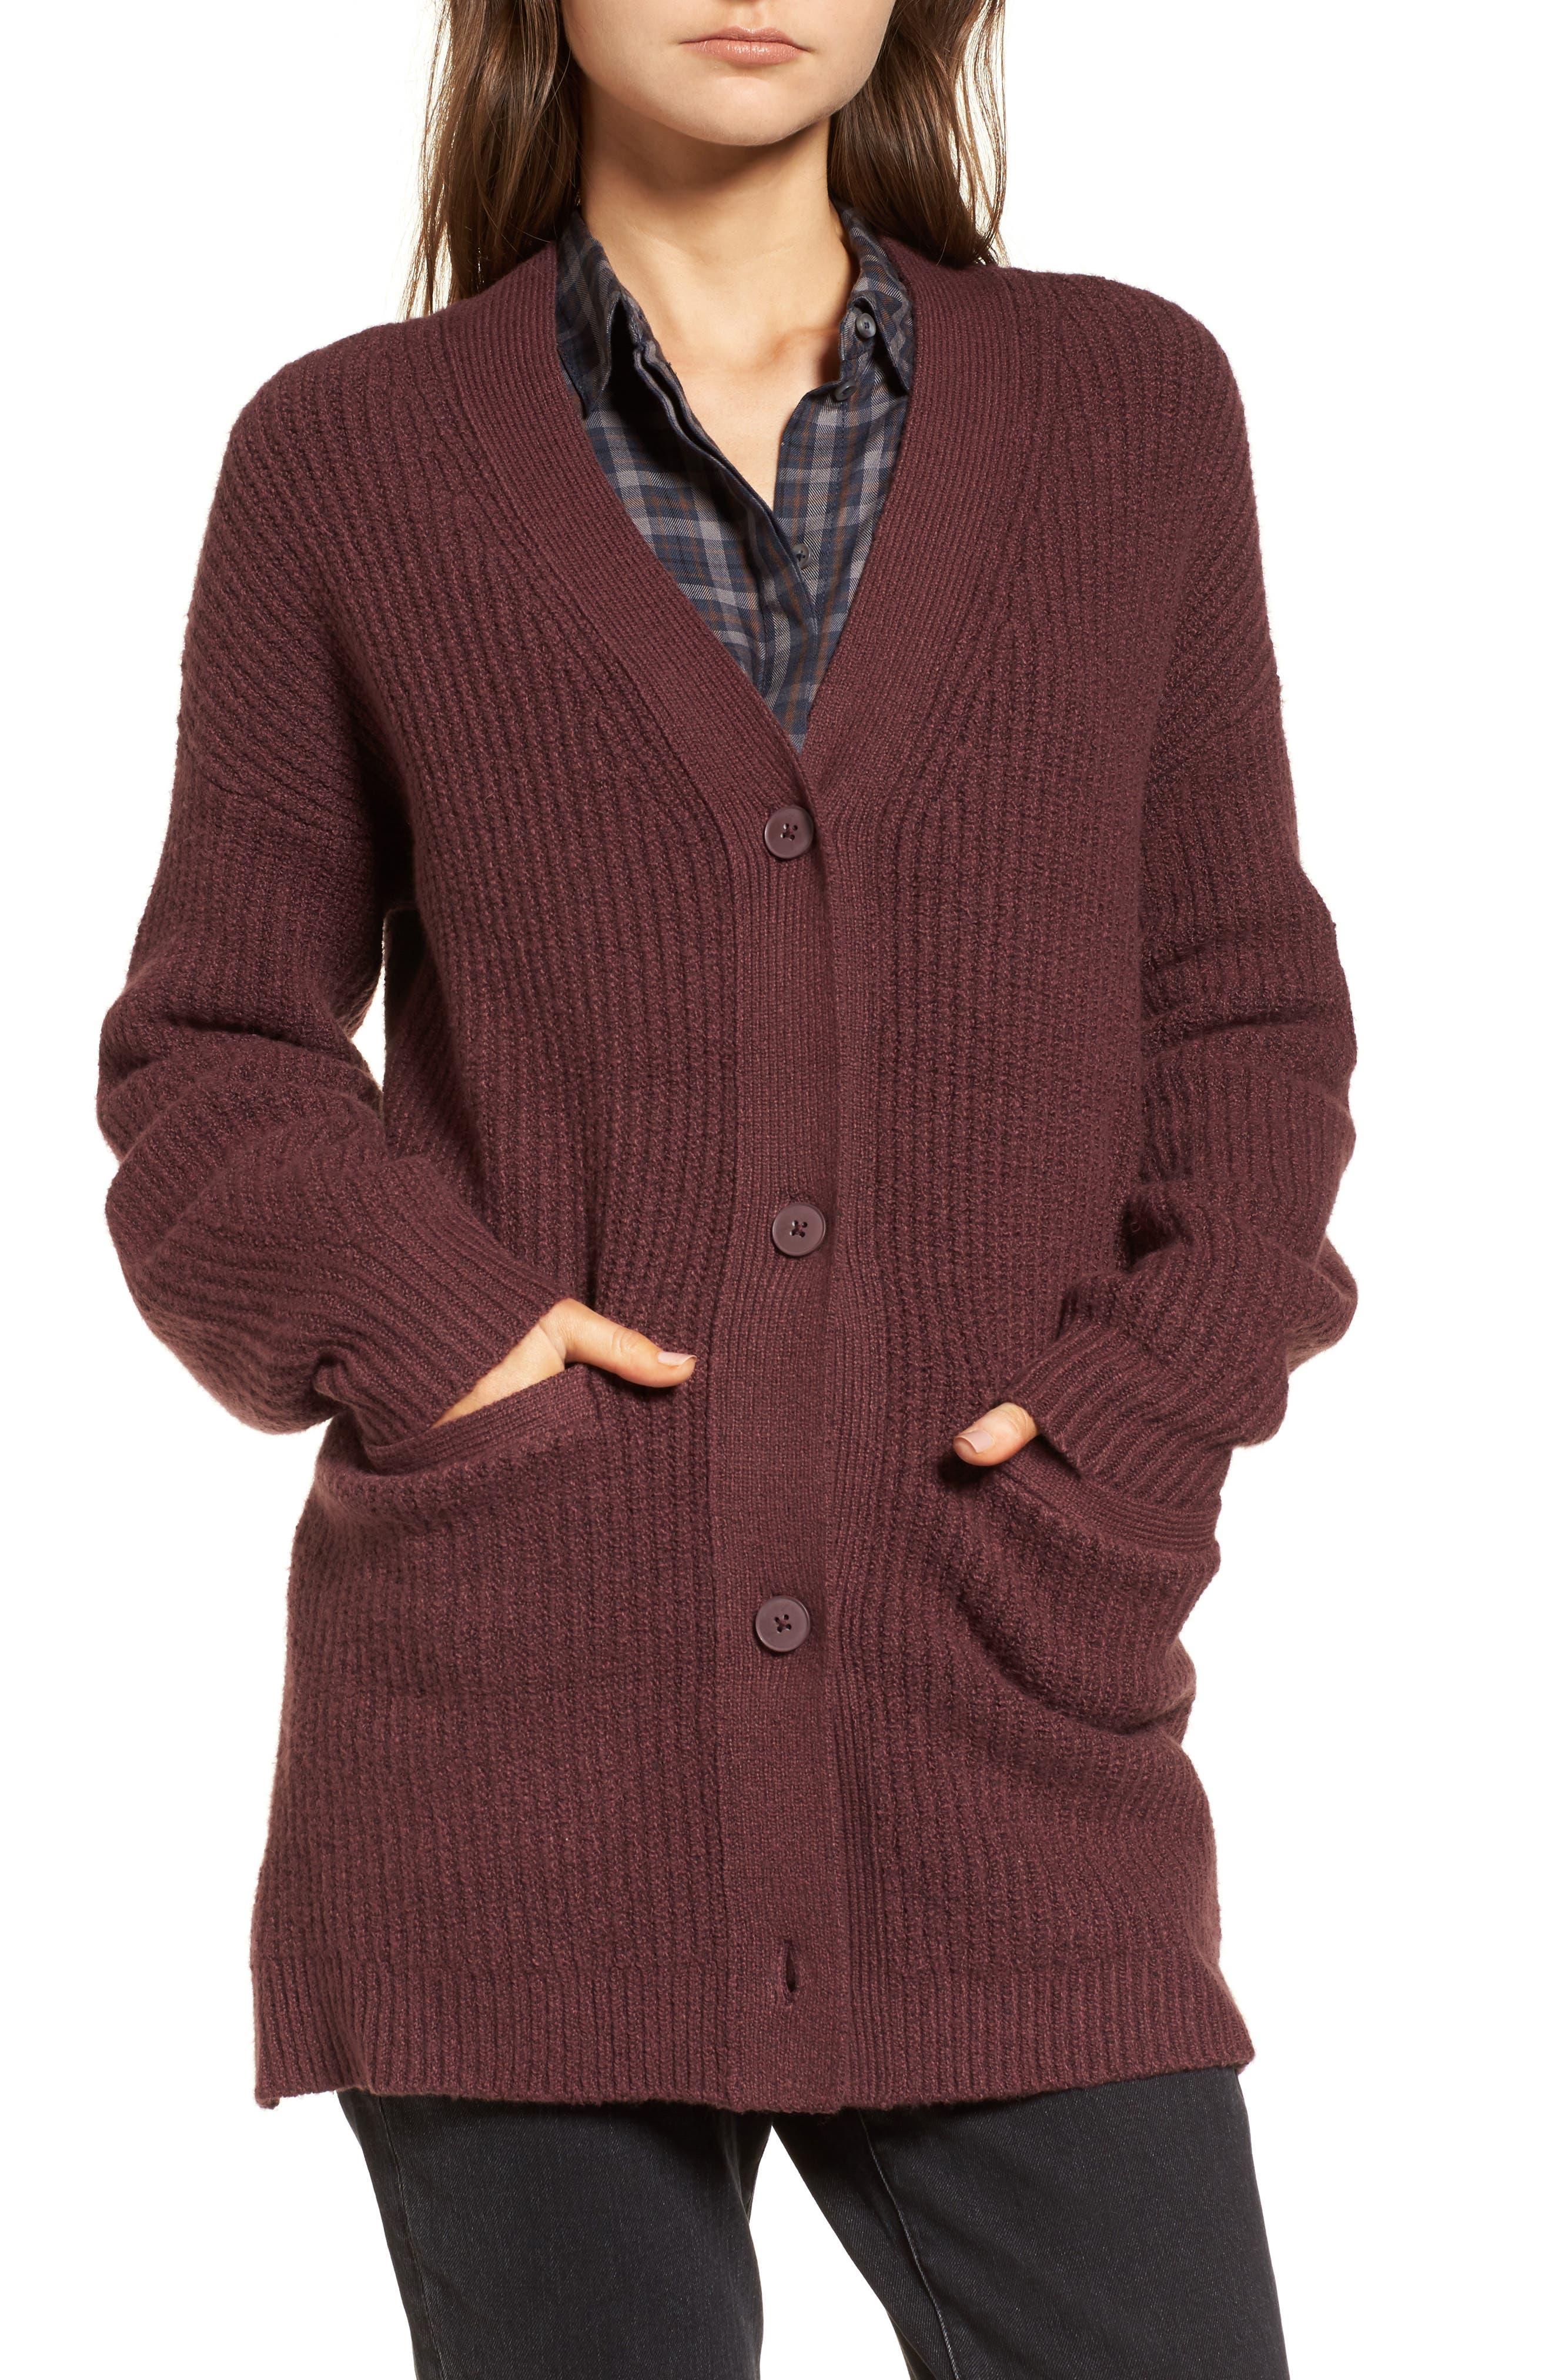 Ribbed Cardigan Sweater,                             Alternate thumbnail 4, color,                             Burgundy Fudge